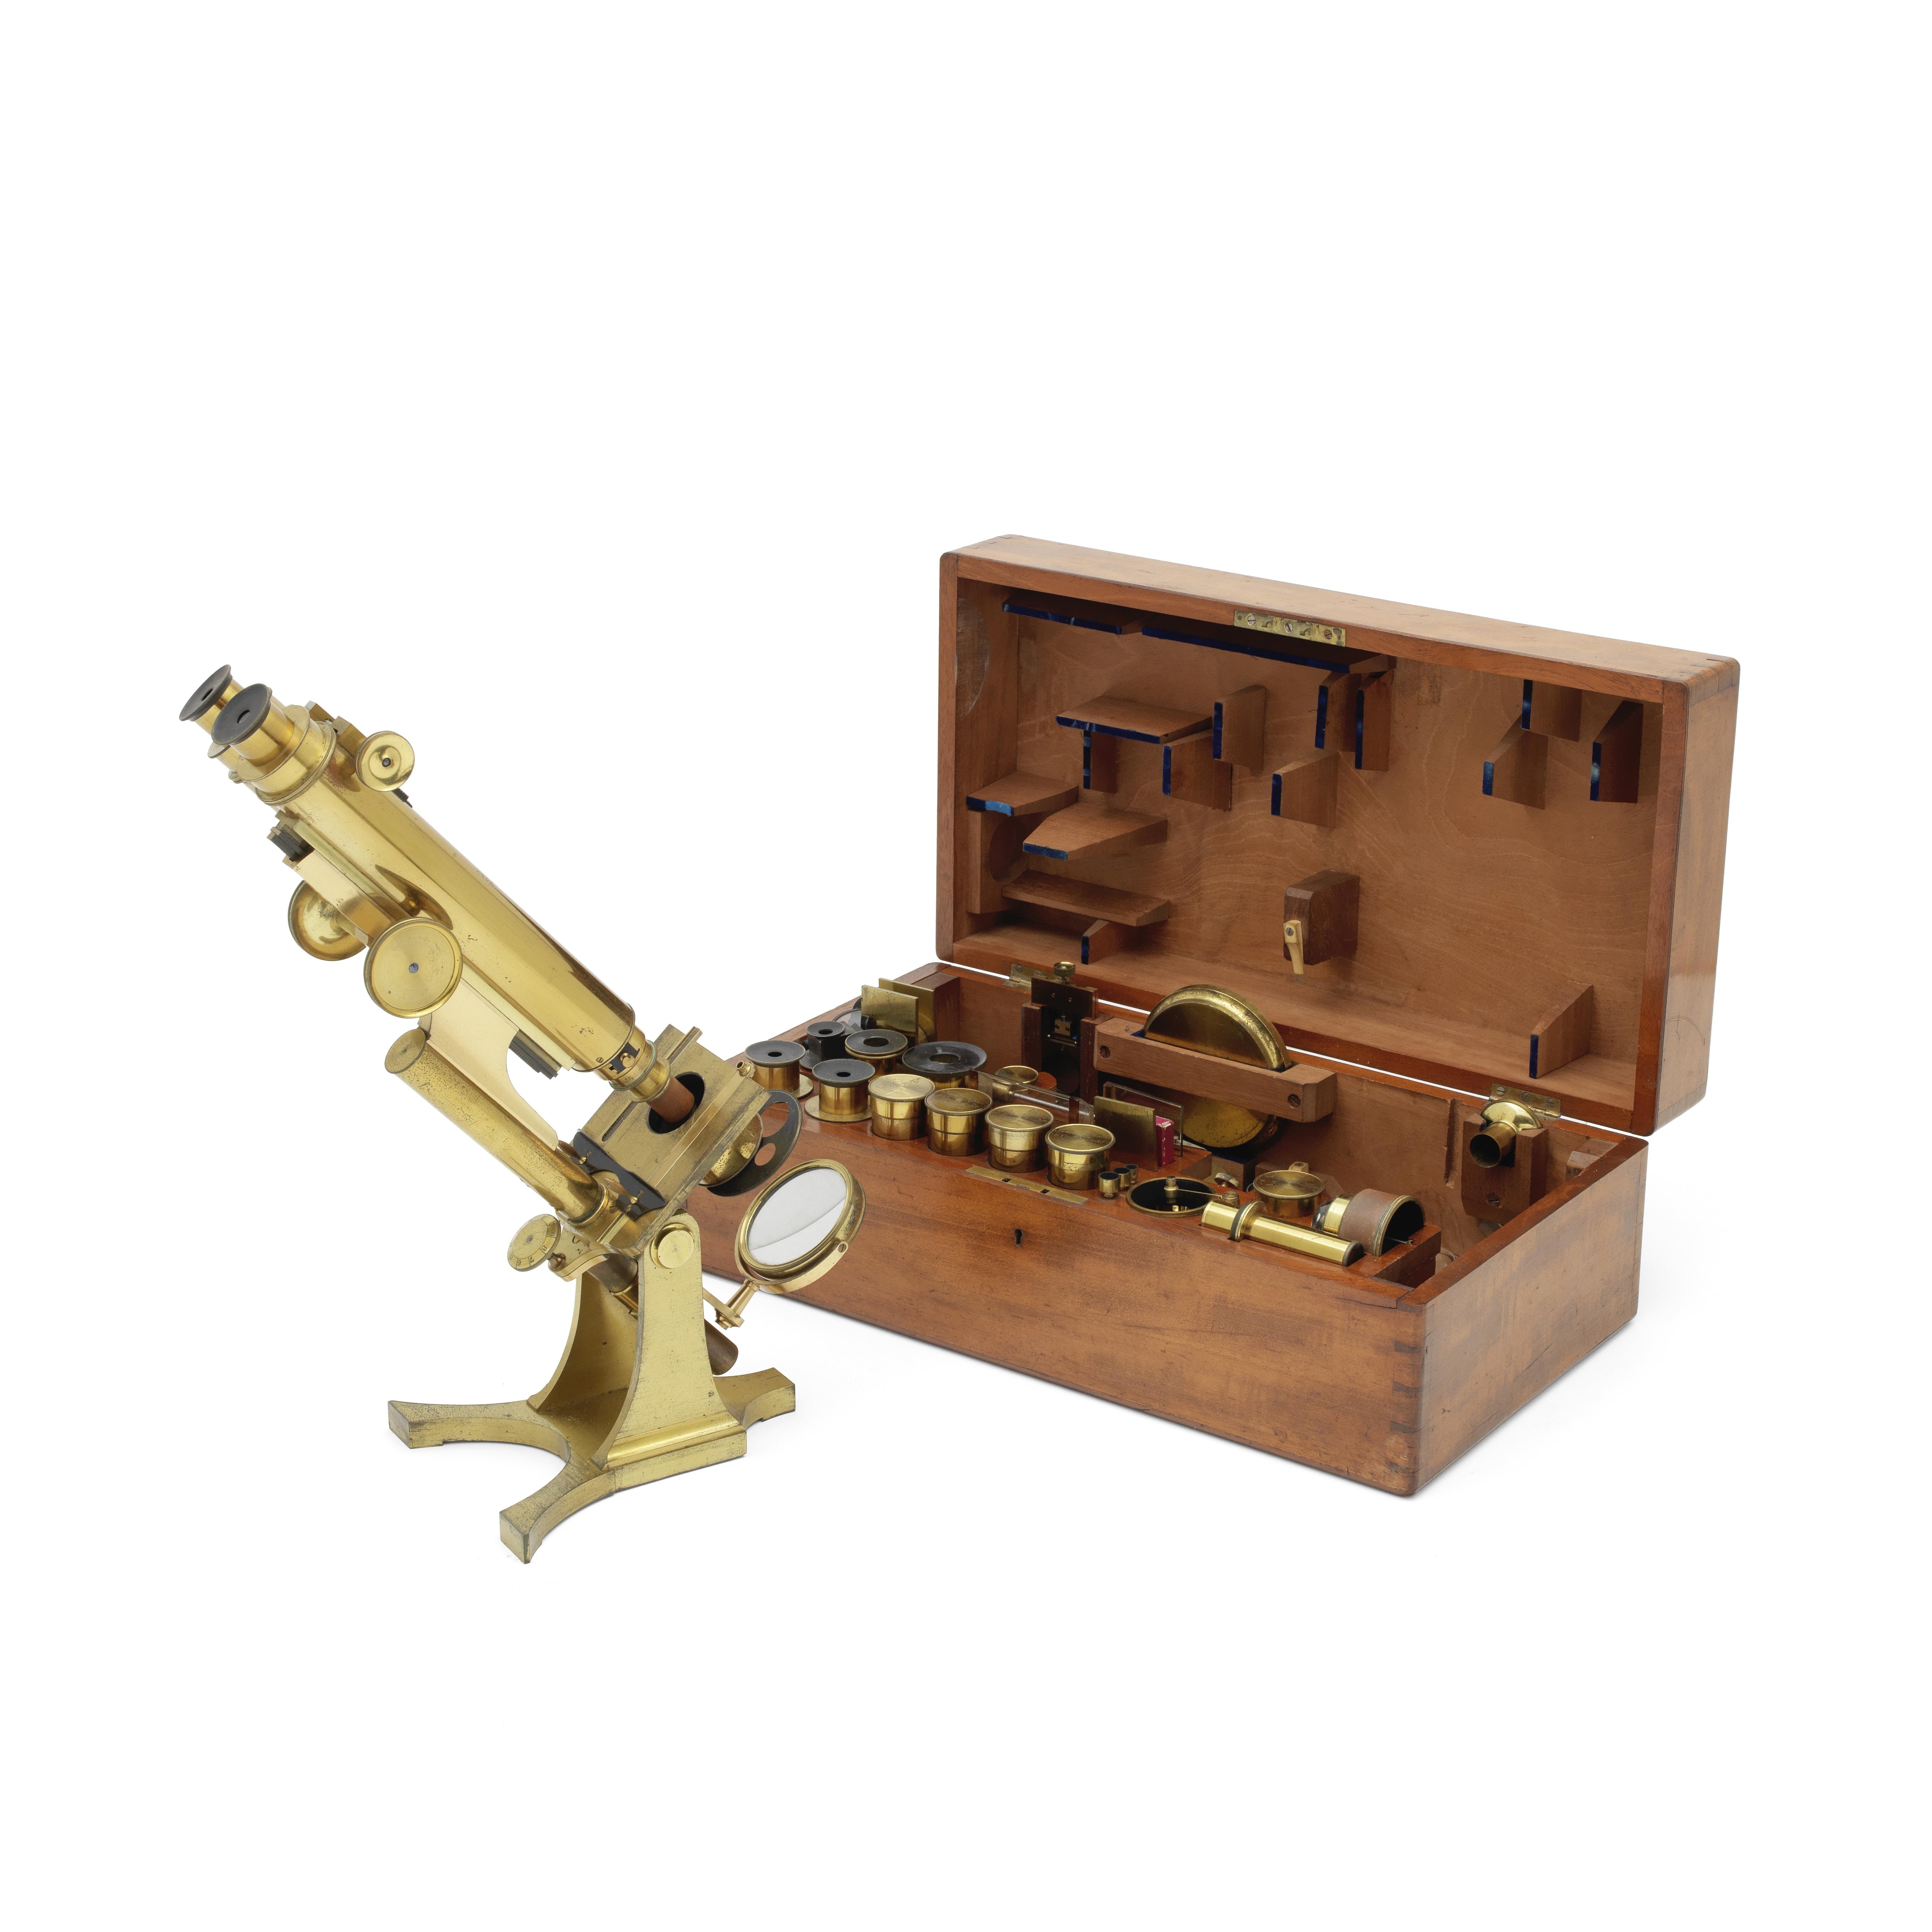 A Smith & Beck Brass Compound Binocular Microscope English, circa 1870,